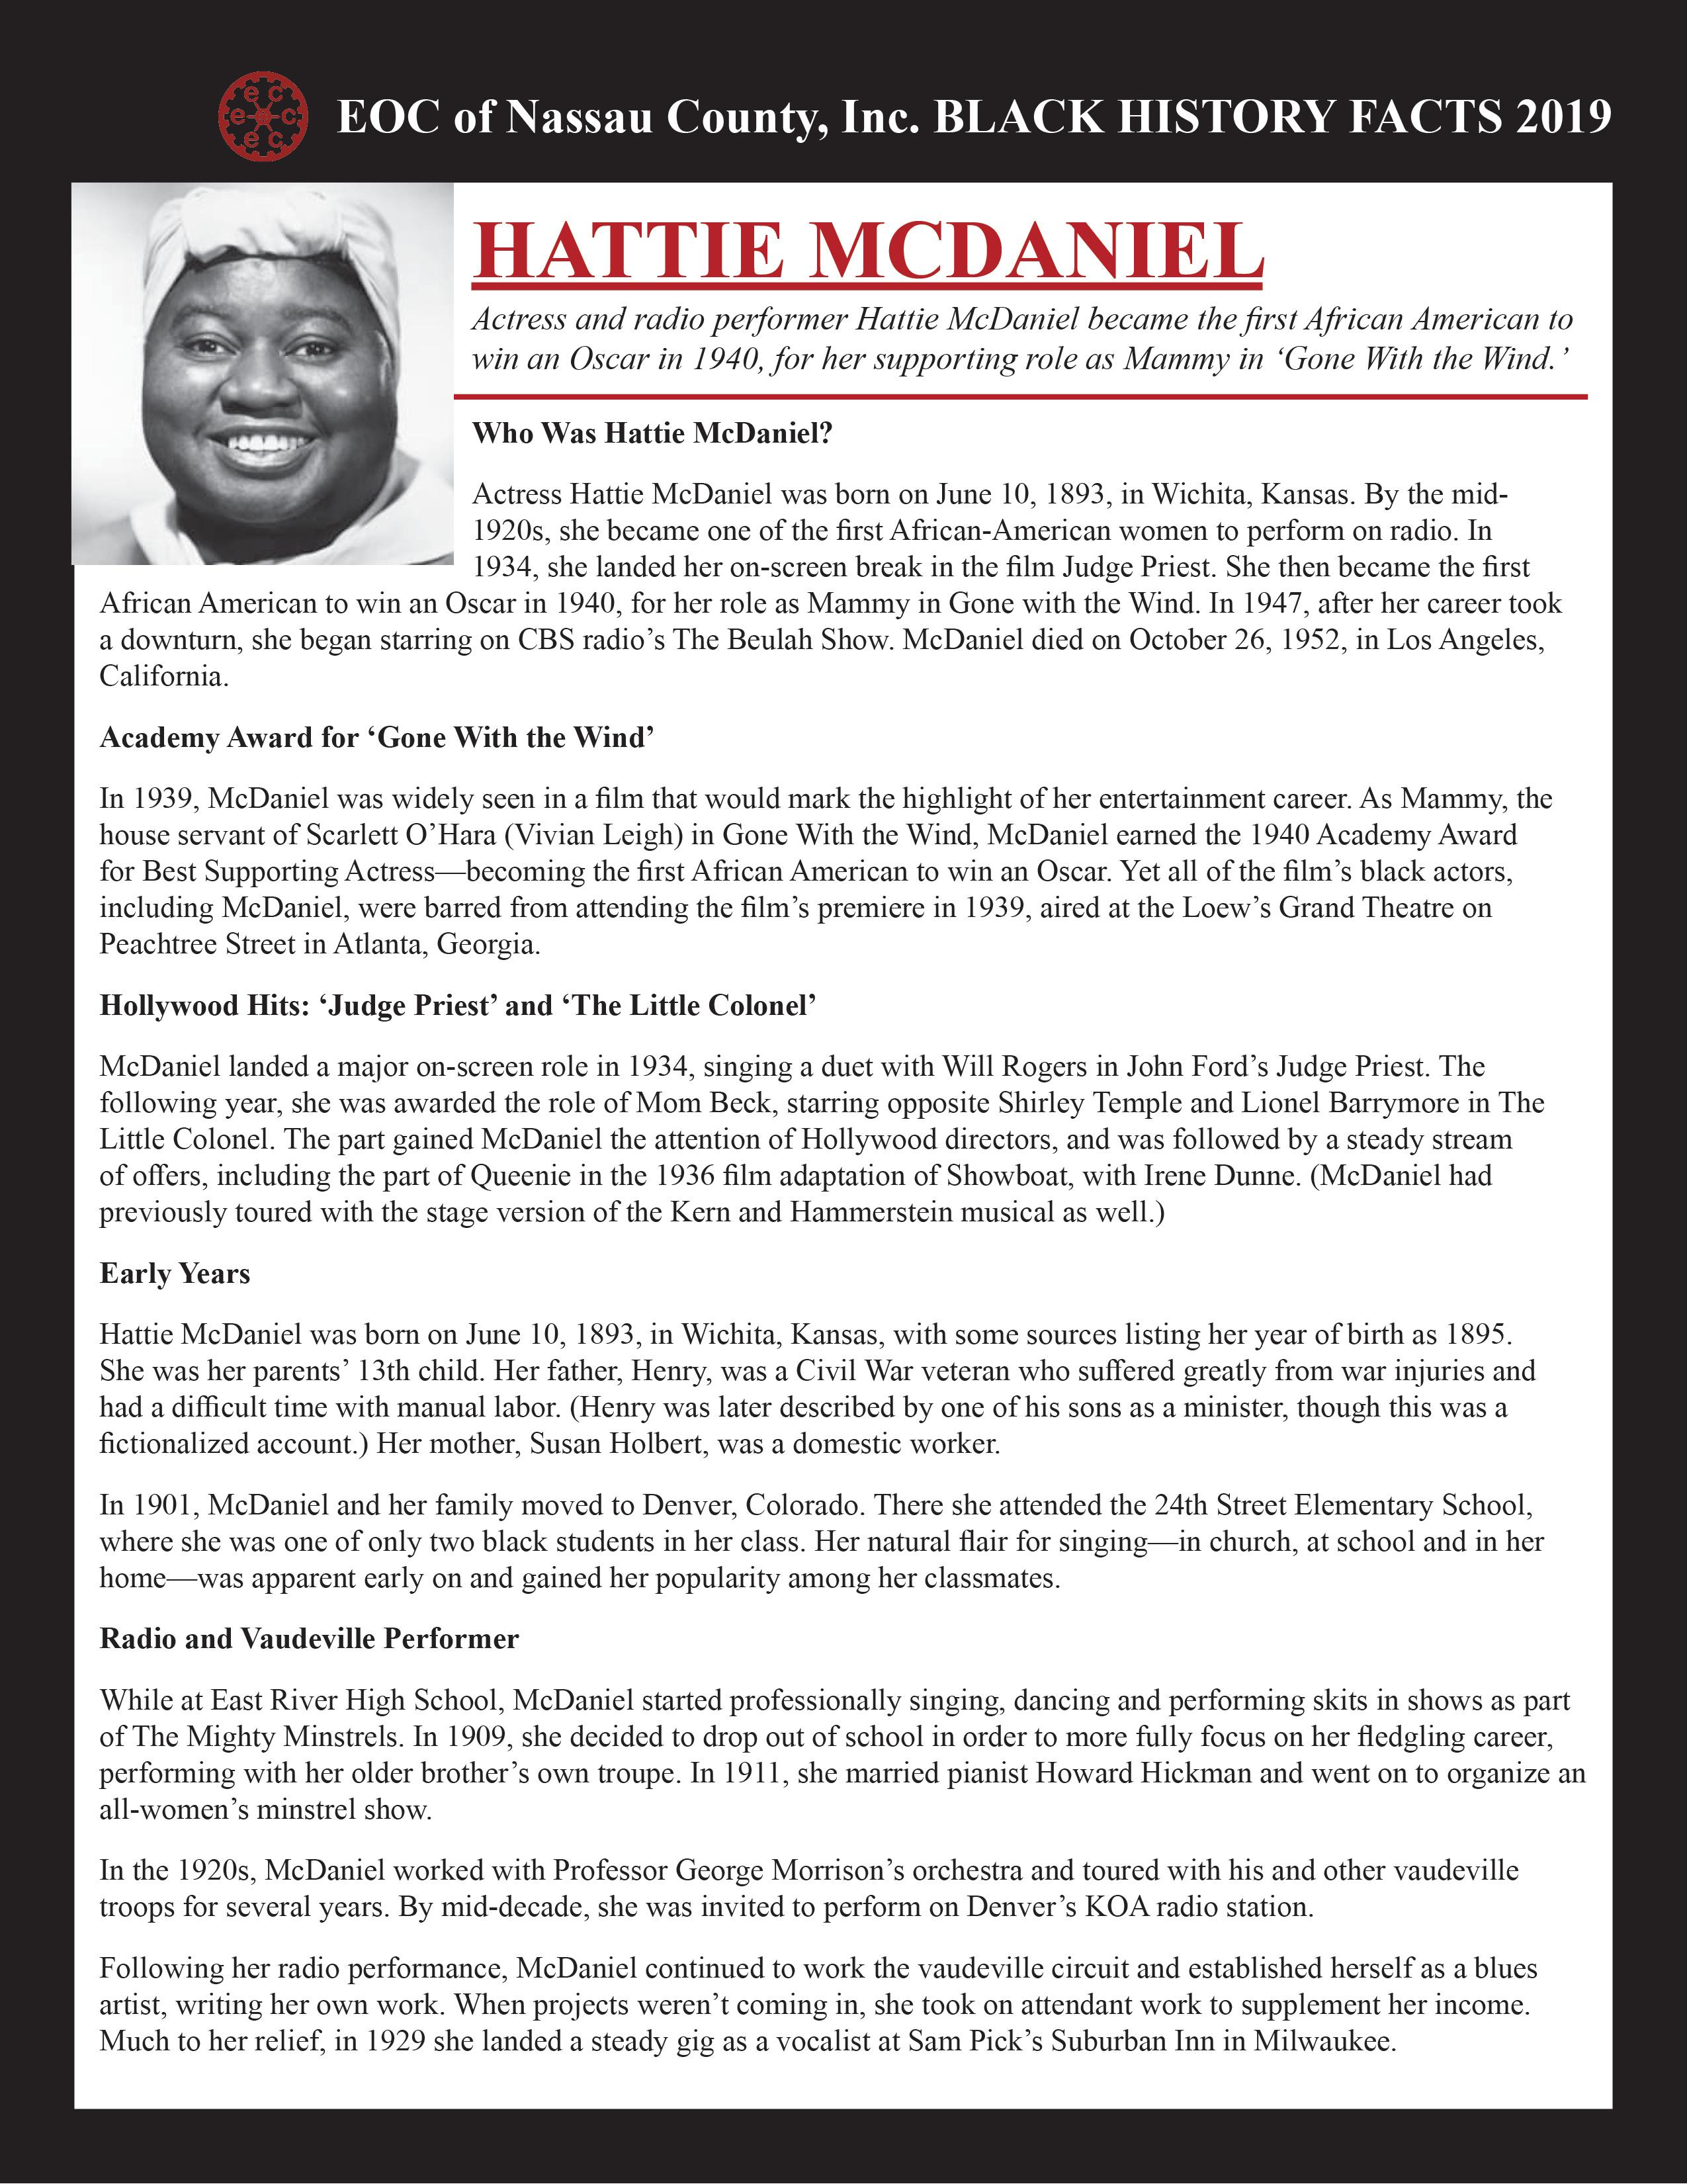 hattie mcdaniel | eoc black history facts 2019 | eoc of